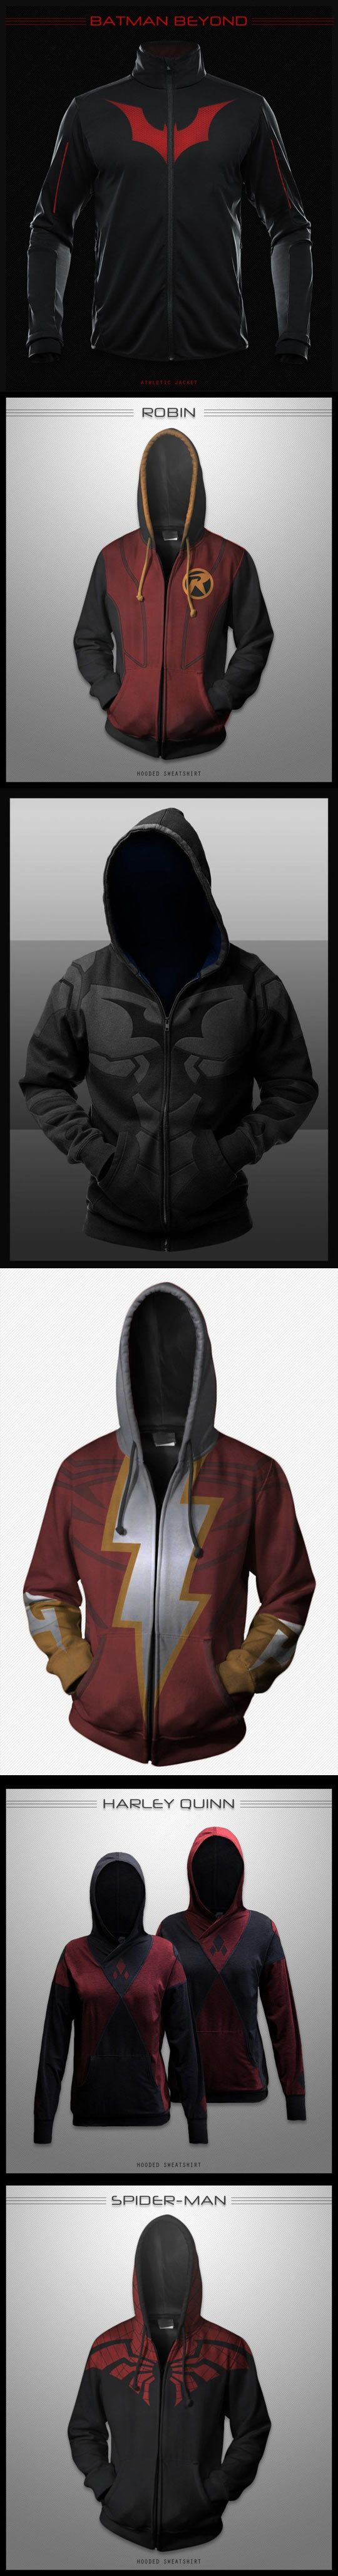 Amazing Concept Hoodies - Batman Beyond, Spiderman, Robin, Flash. I really like the Robin one.